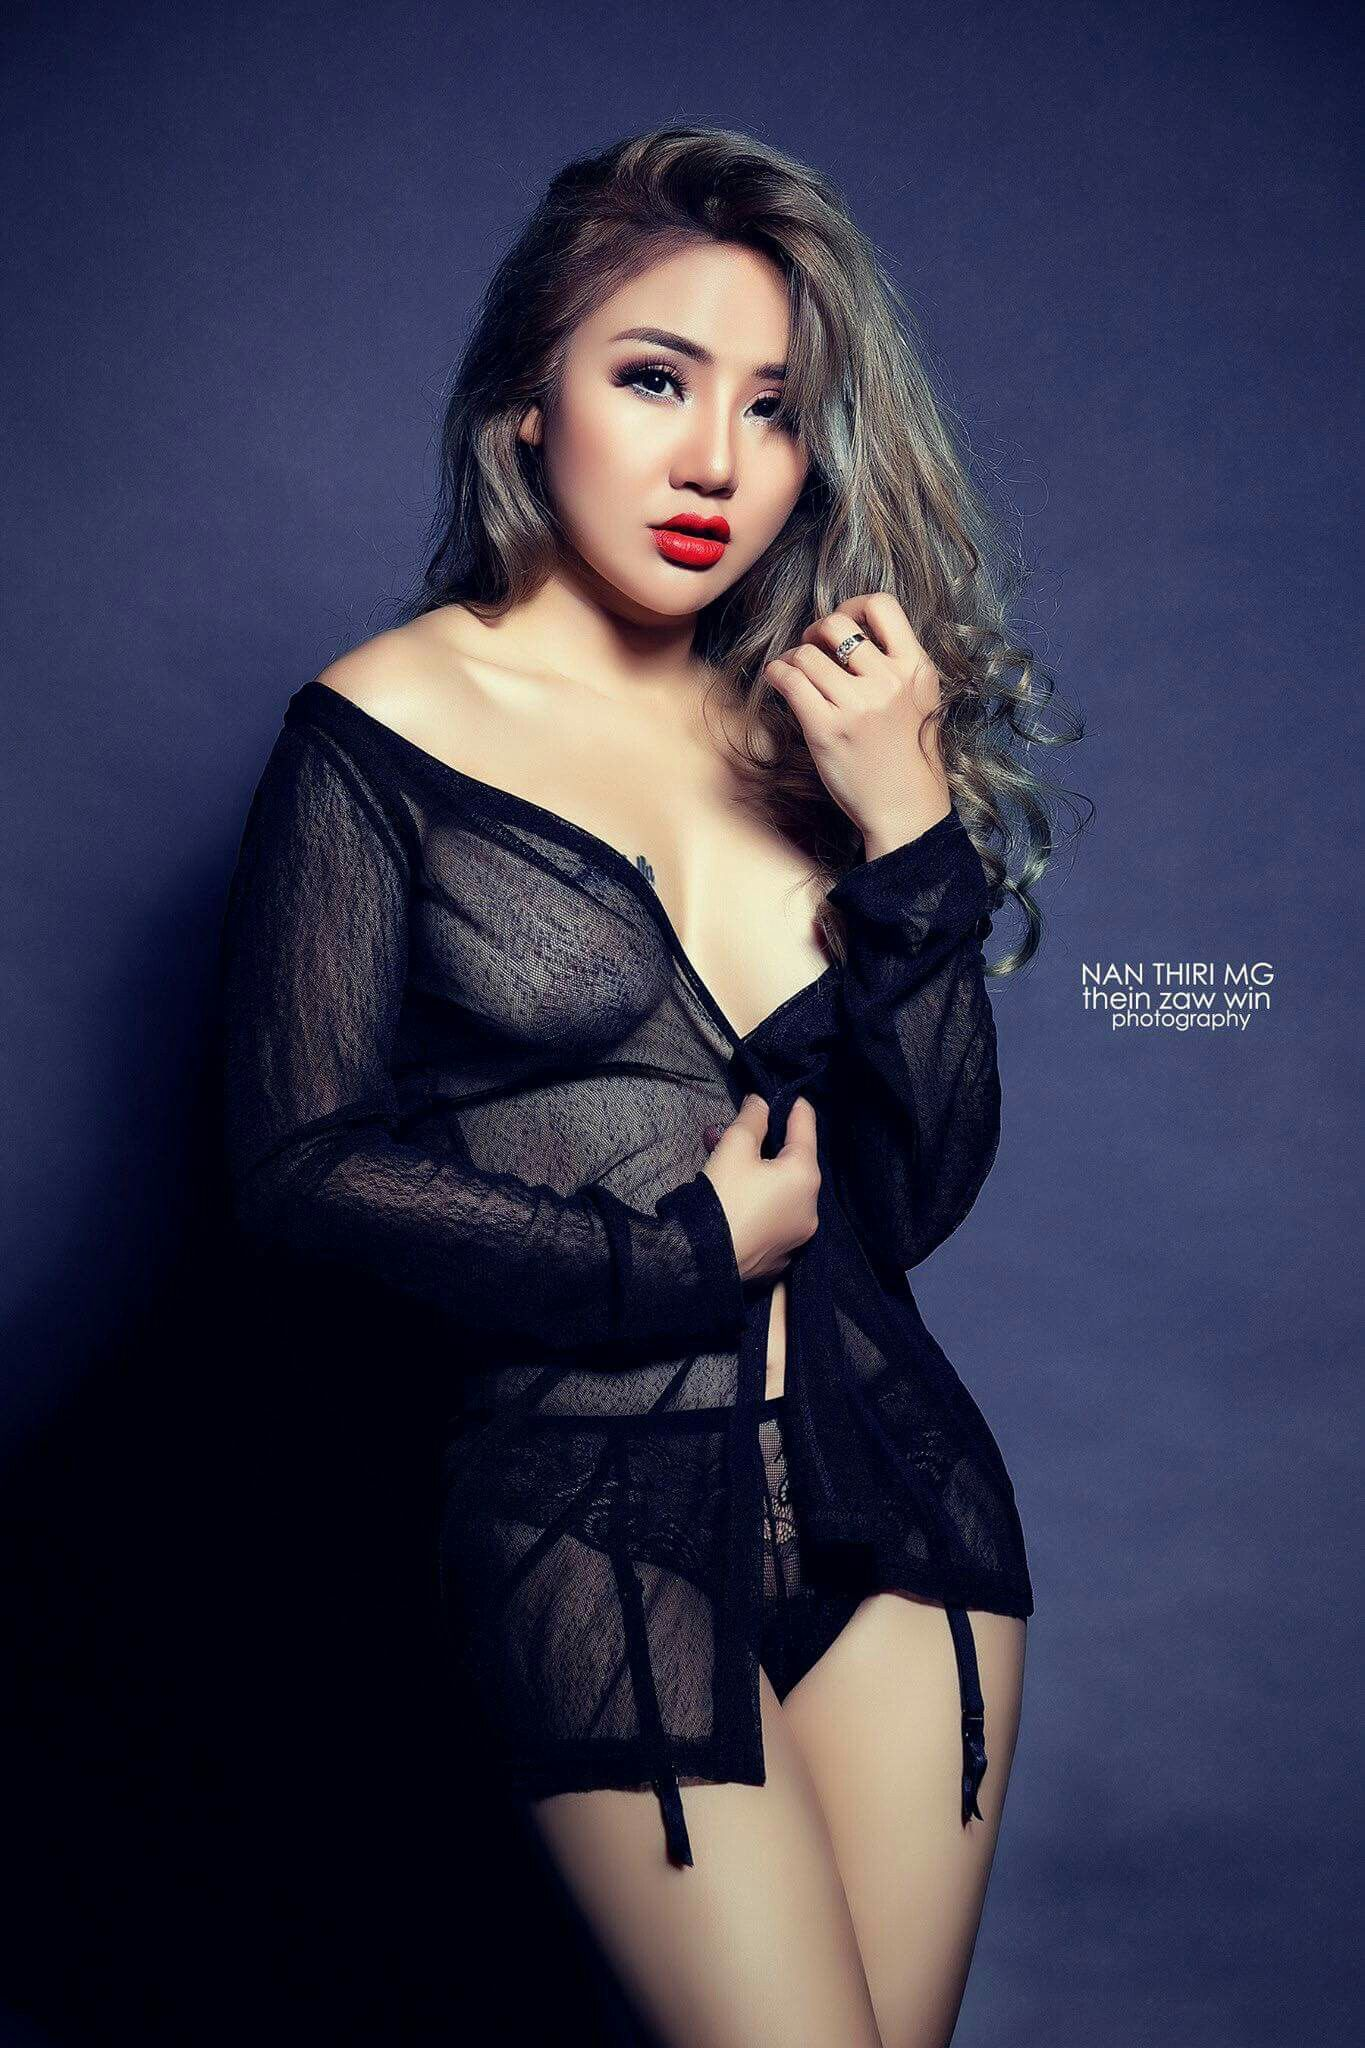 Nan Thiri Mg | Model photos, Super hot photos, Model